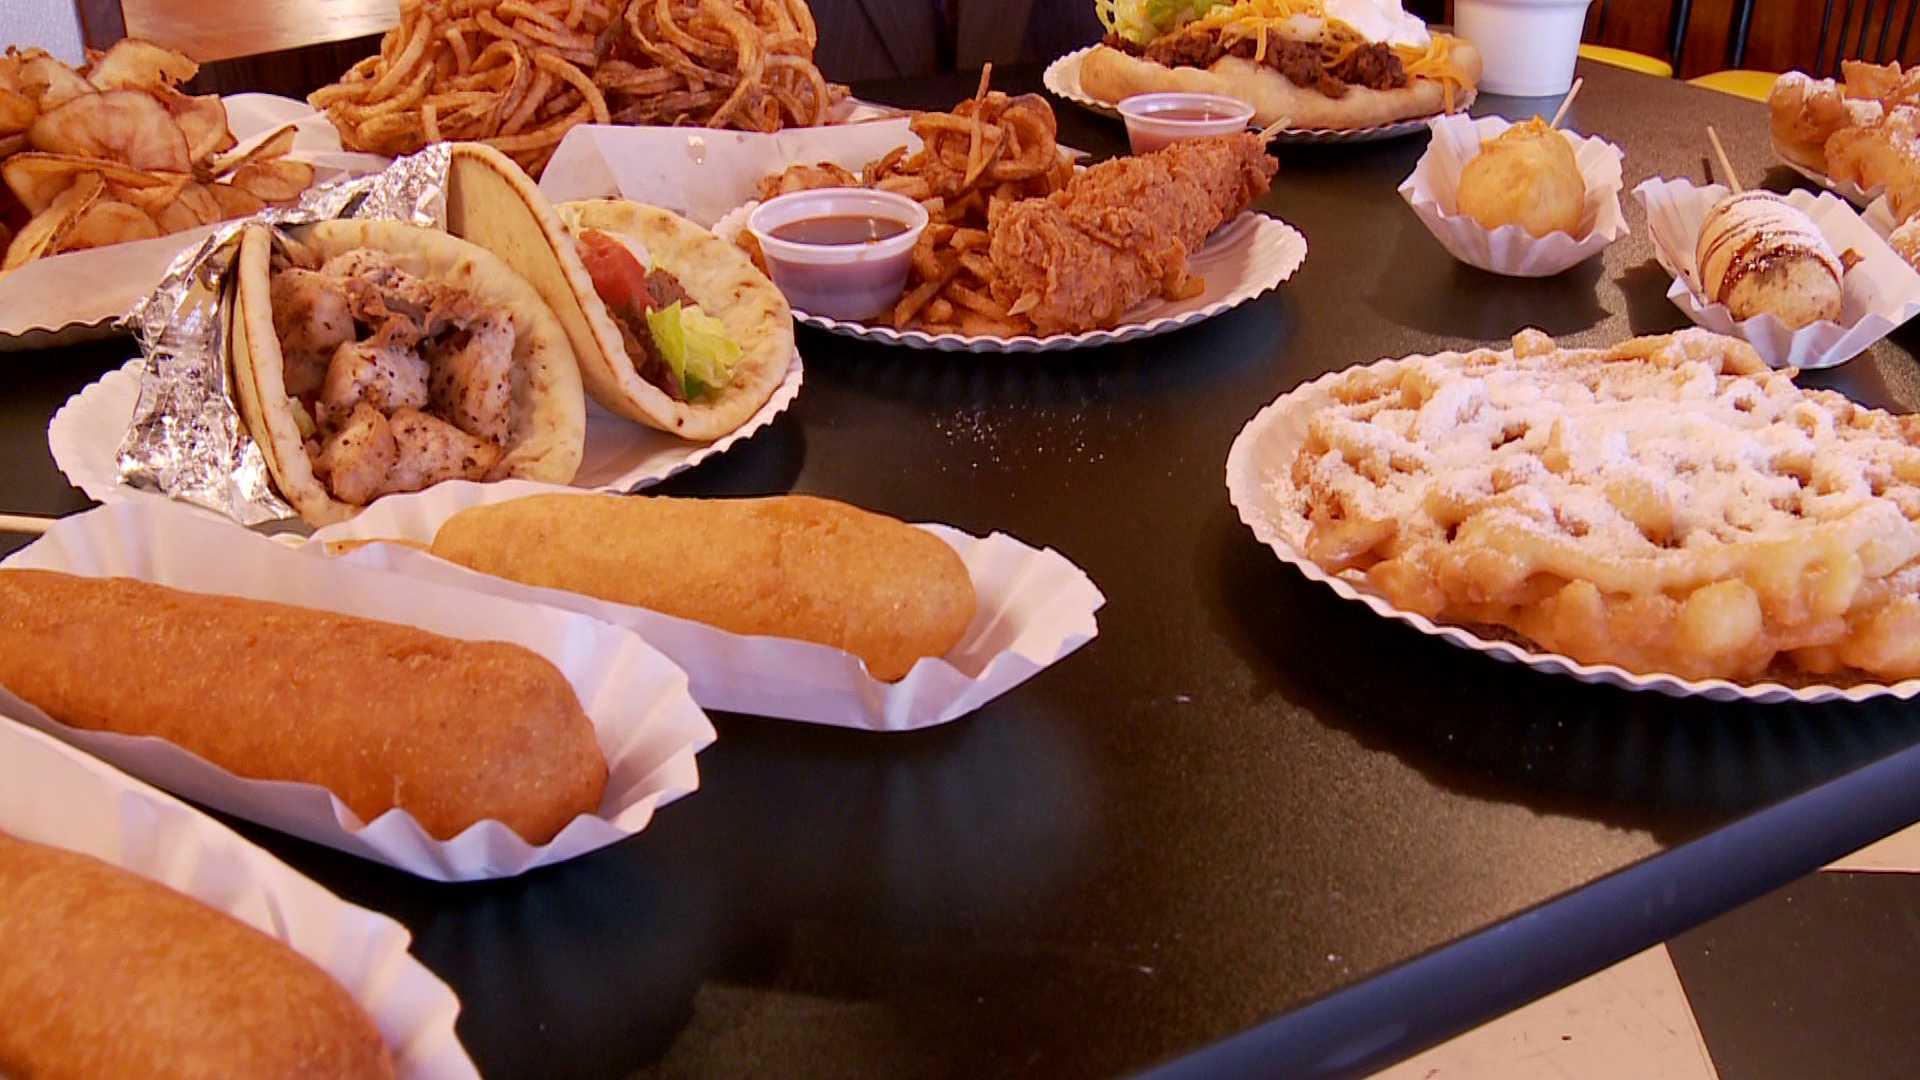 State fair food